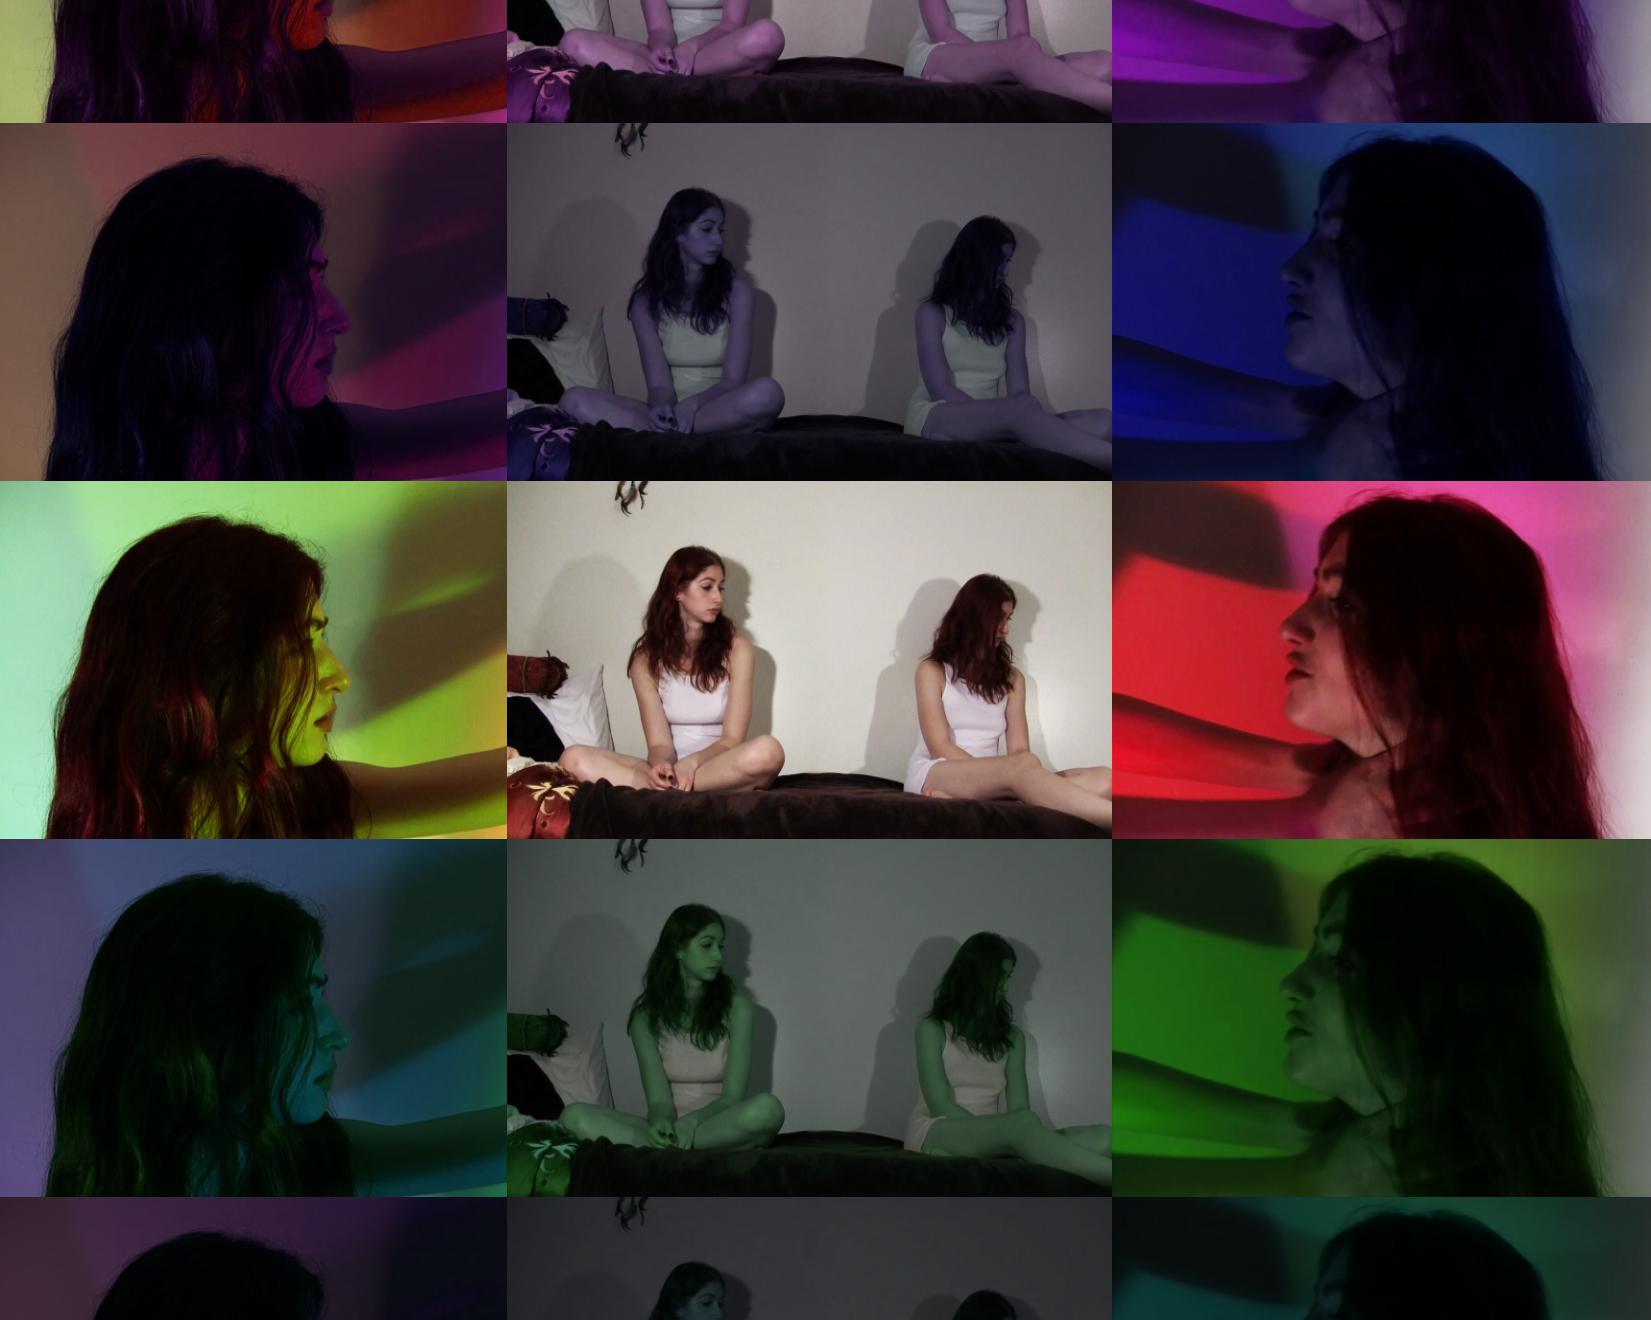 Three-channel video by Geena Matuson (@geenamatuson), 2011.